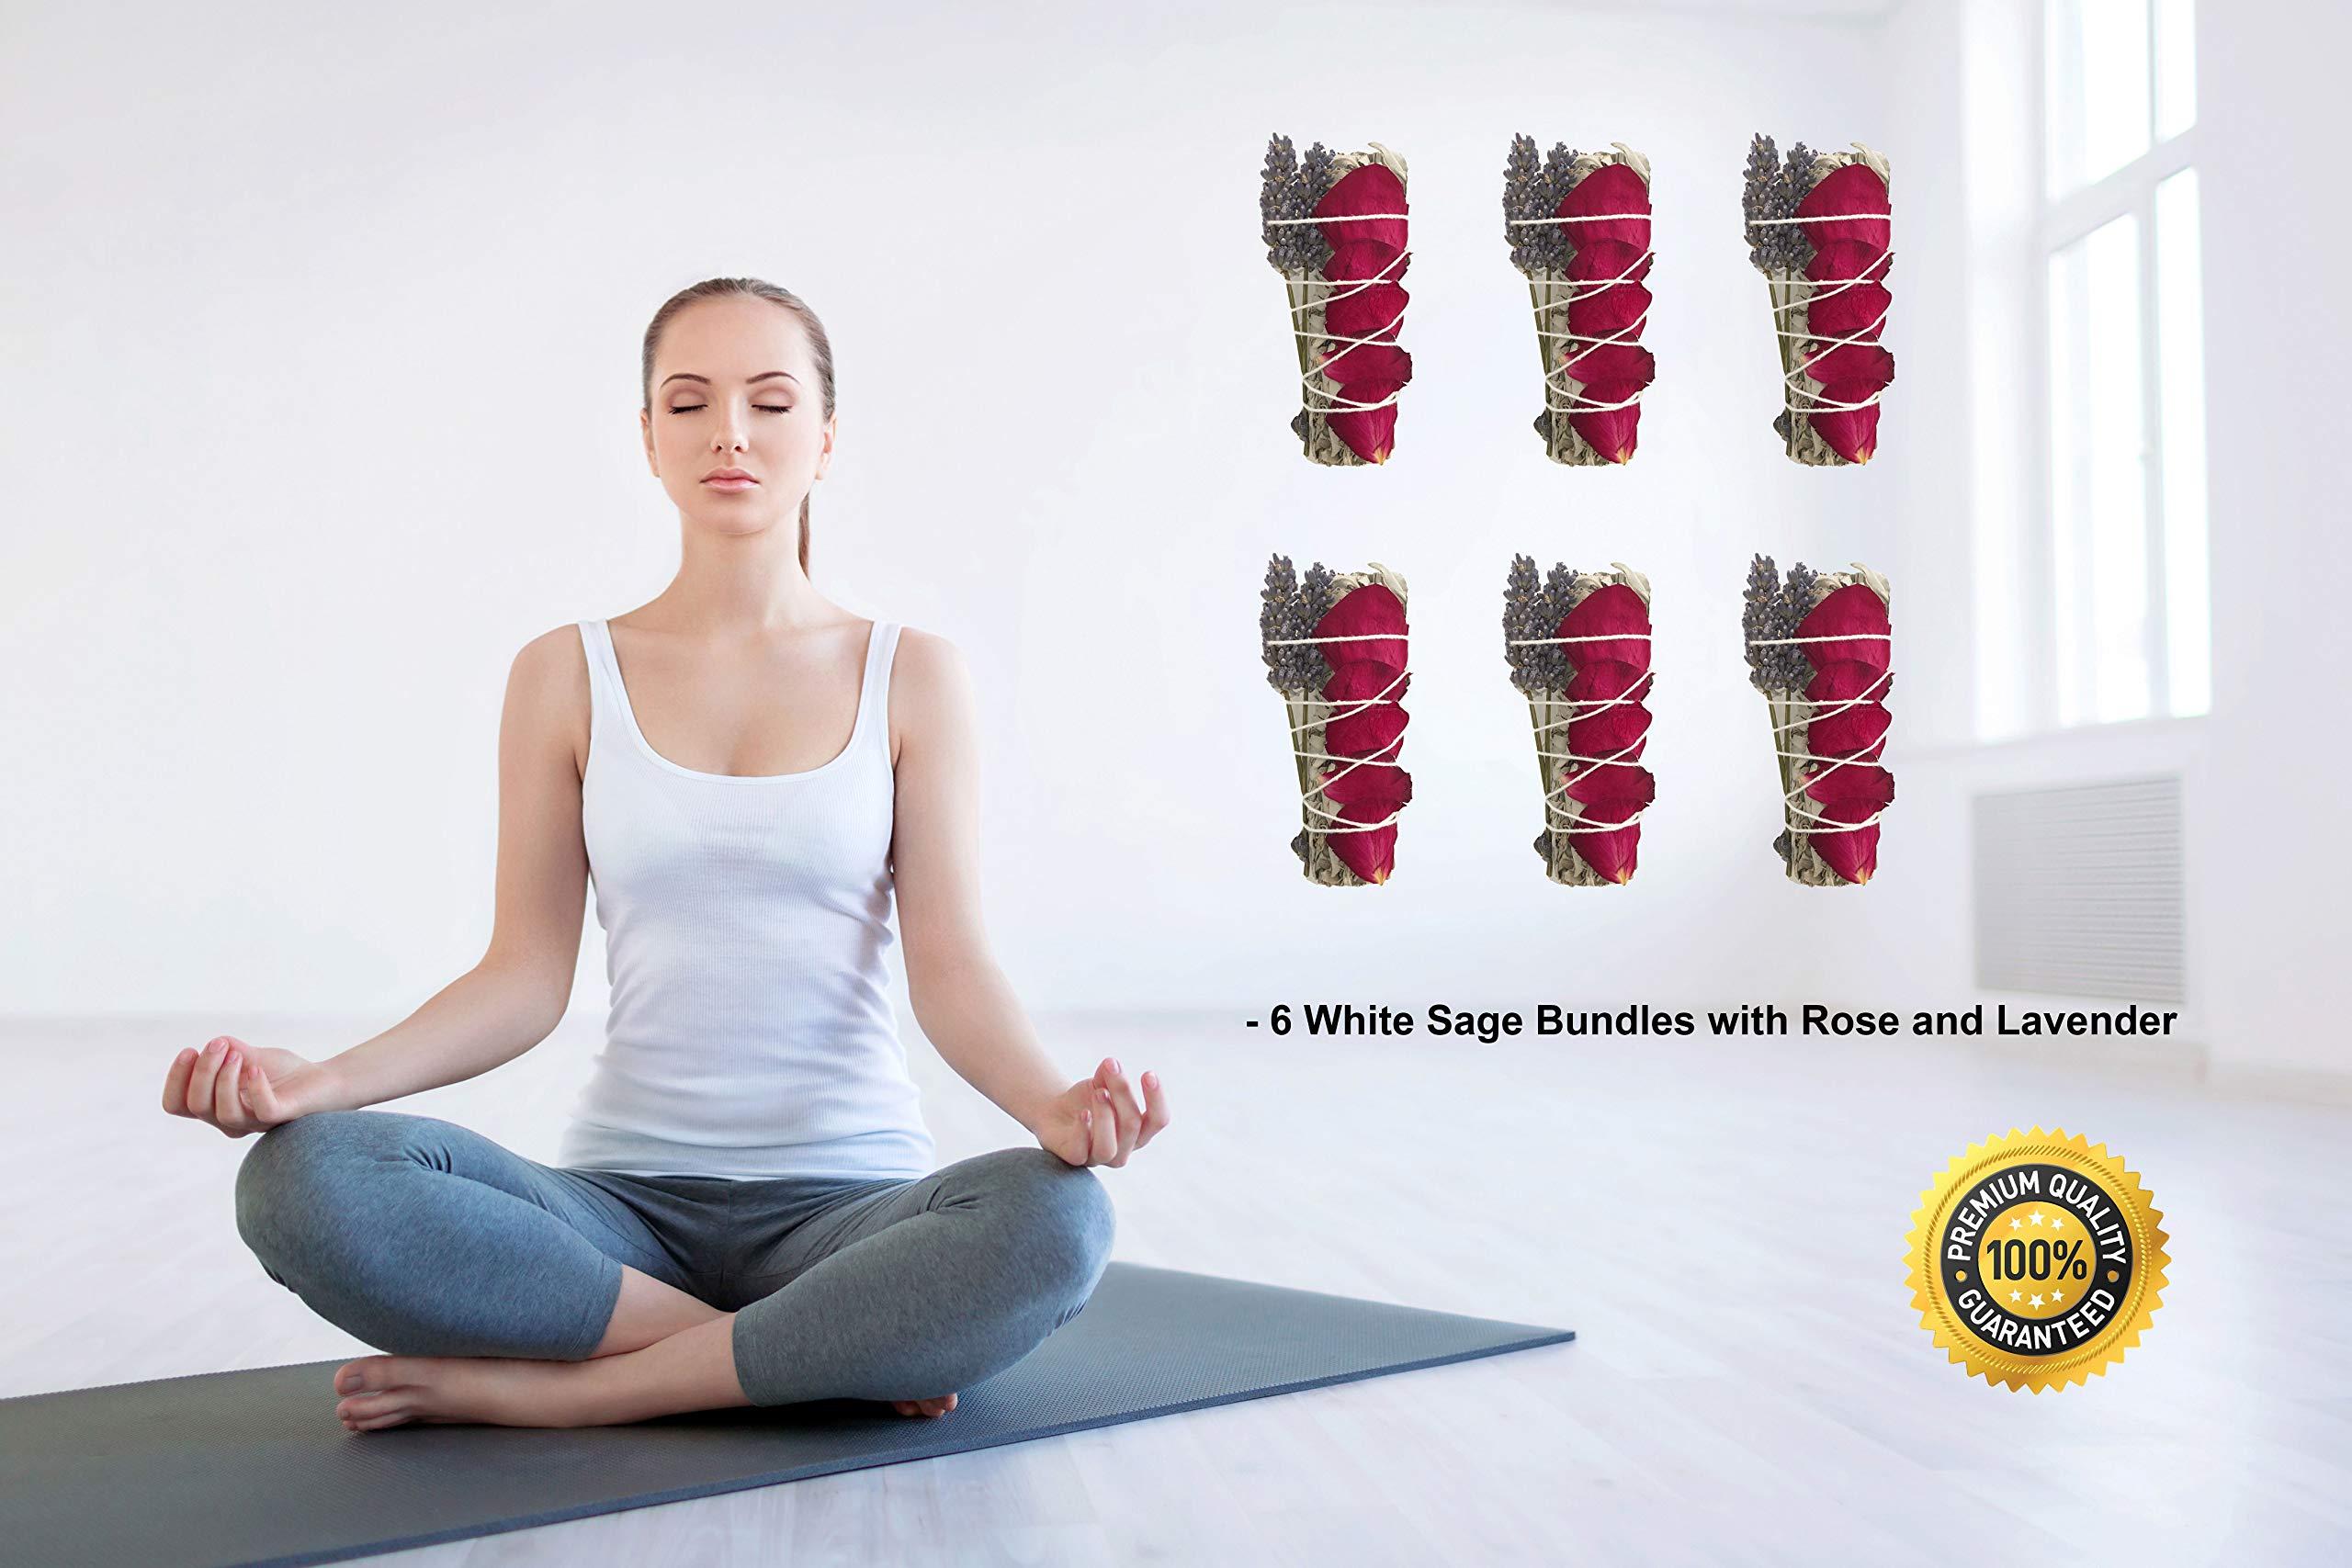 TOMOKO White Sage Smudge Kit - 6 White Sage with Rose and Lavender! Healing, Purifying, Meditating, Incense & Cleansing by TOMOKO (Image #2)